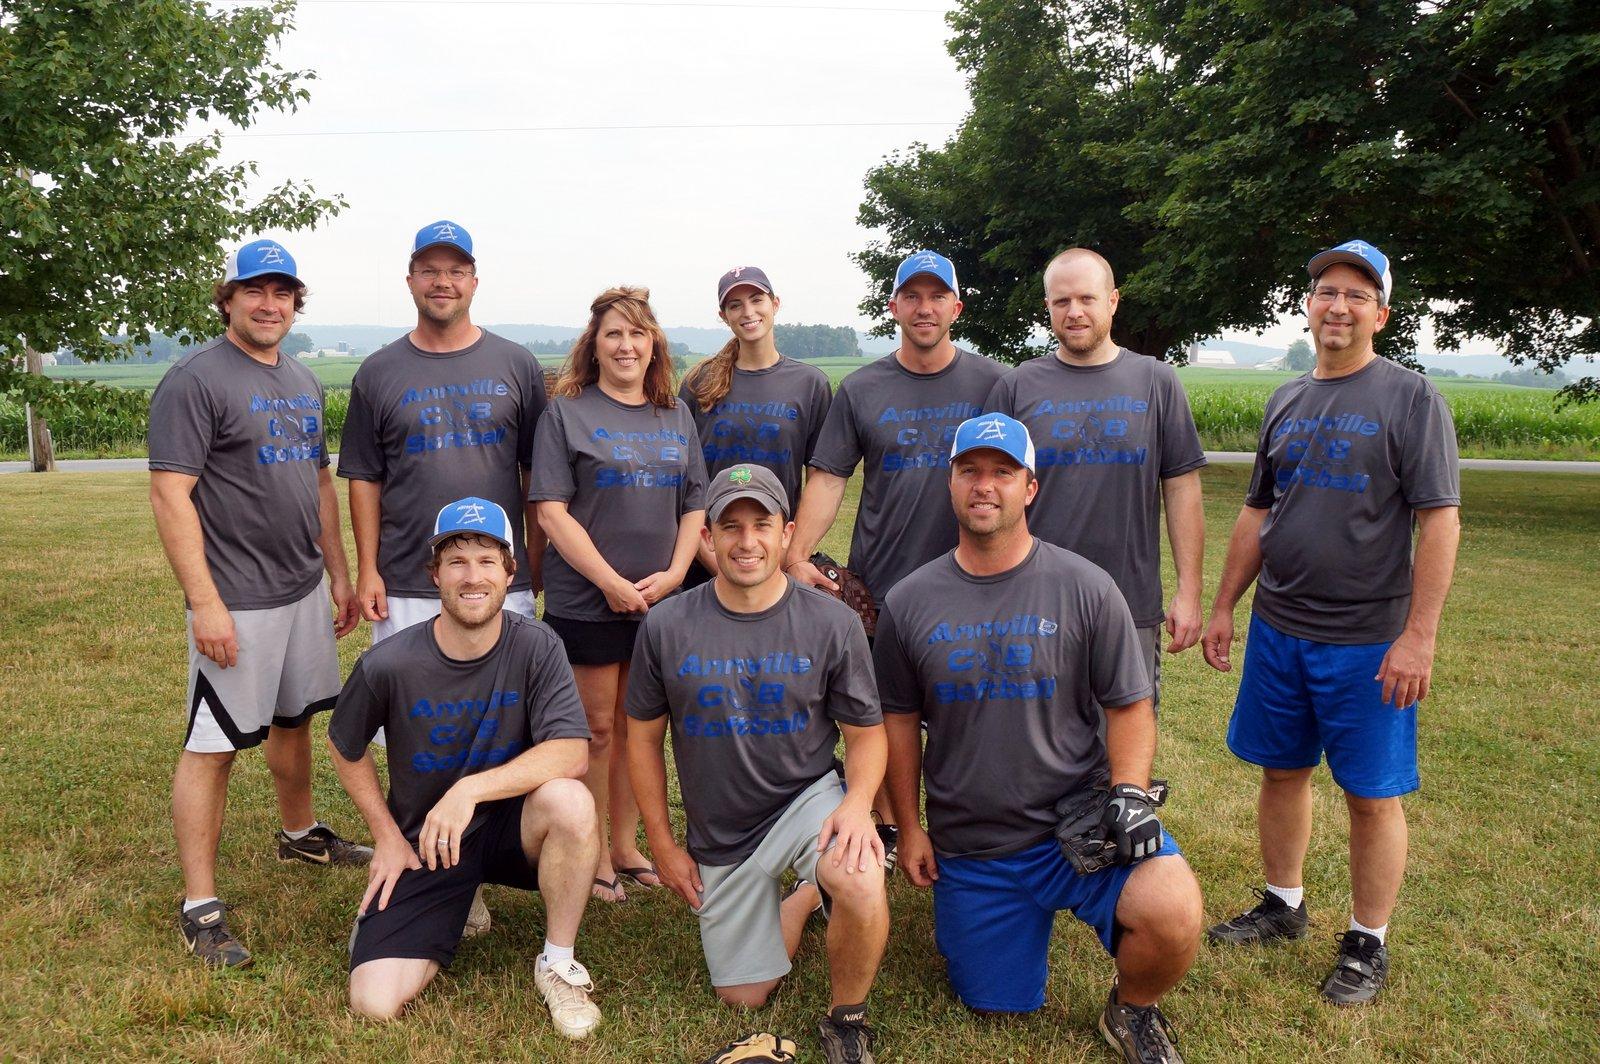 ACoB Softball Team 7-9-13.JPG